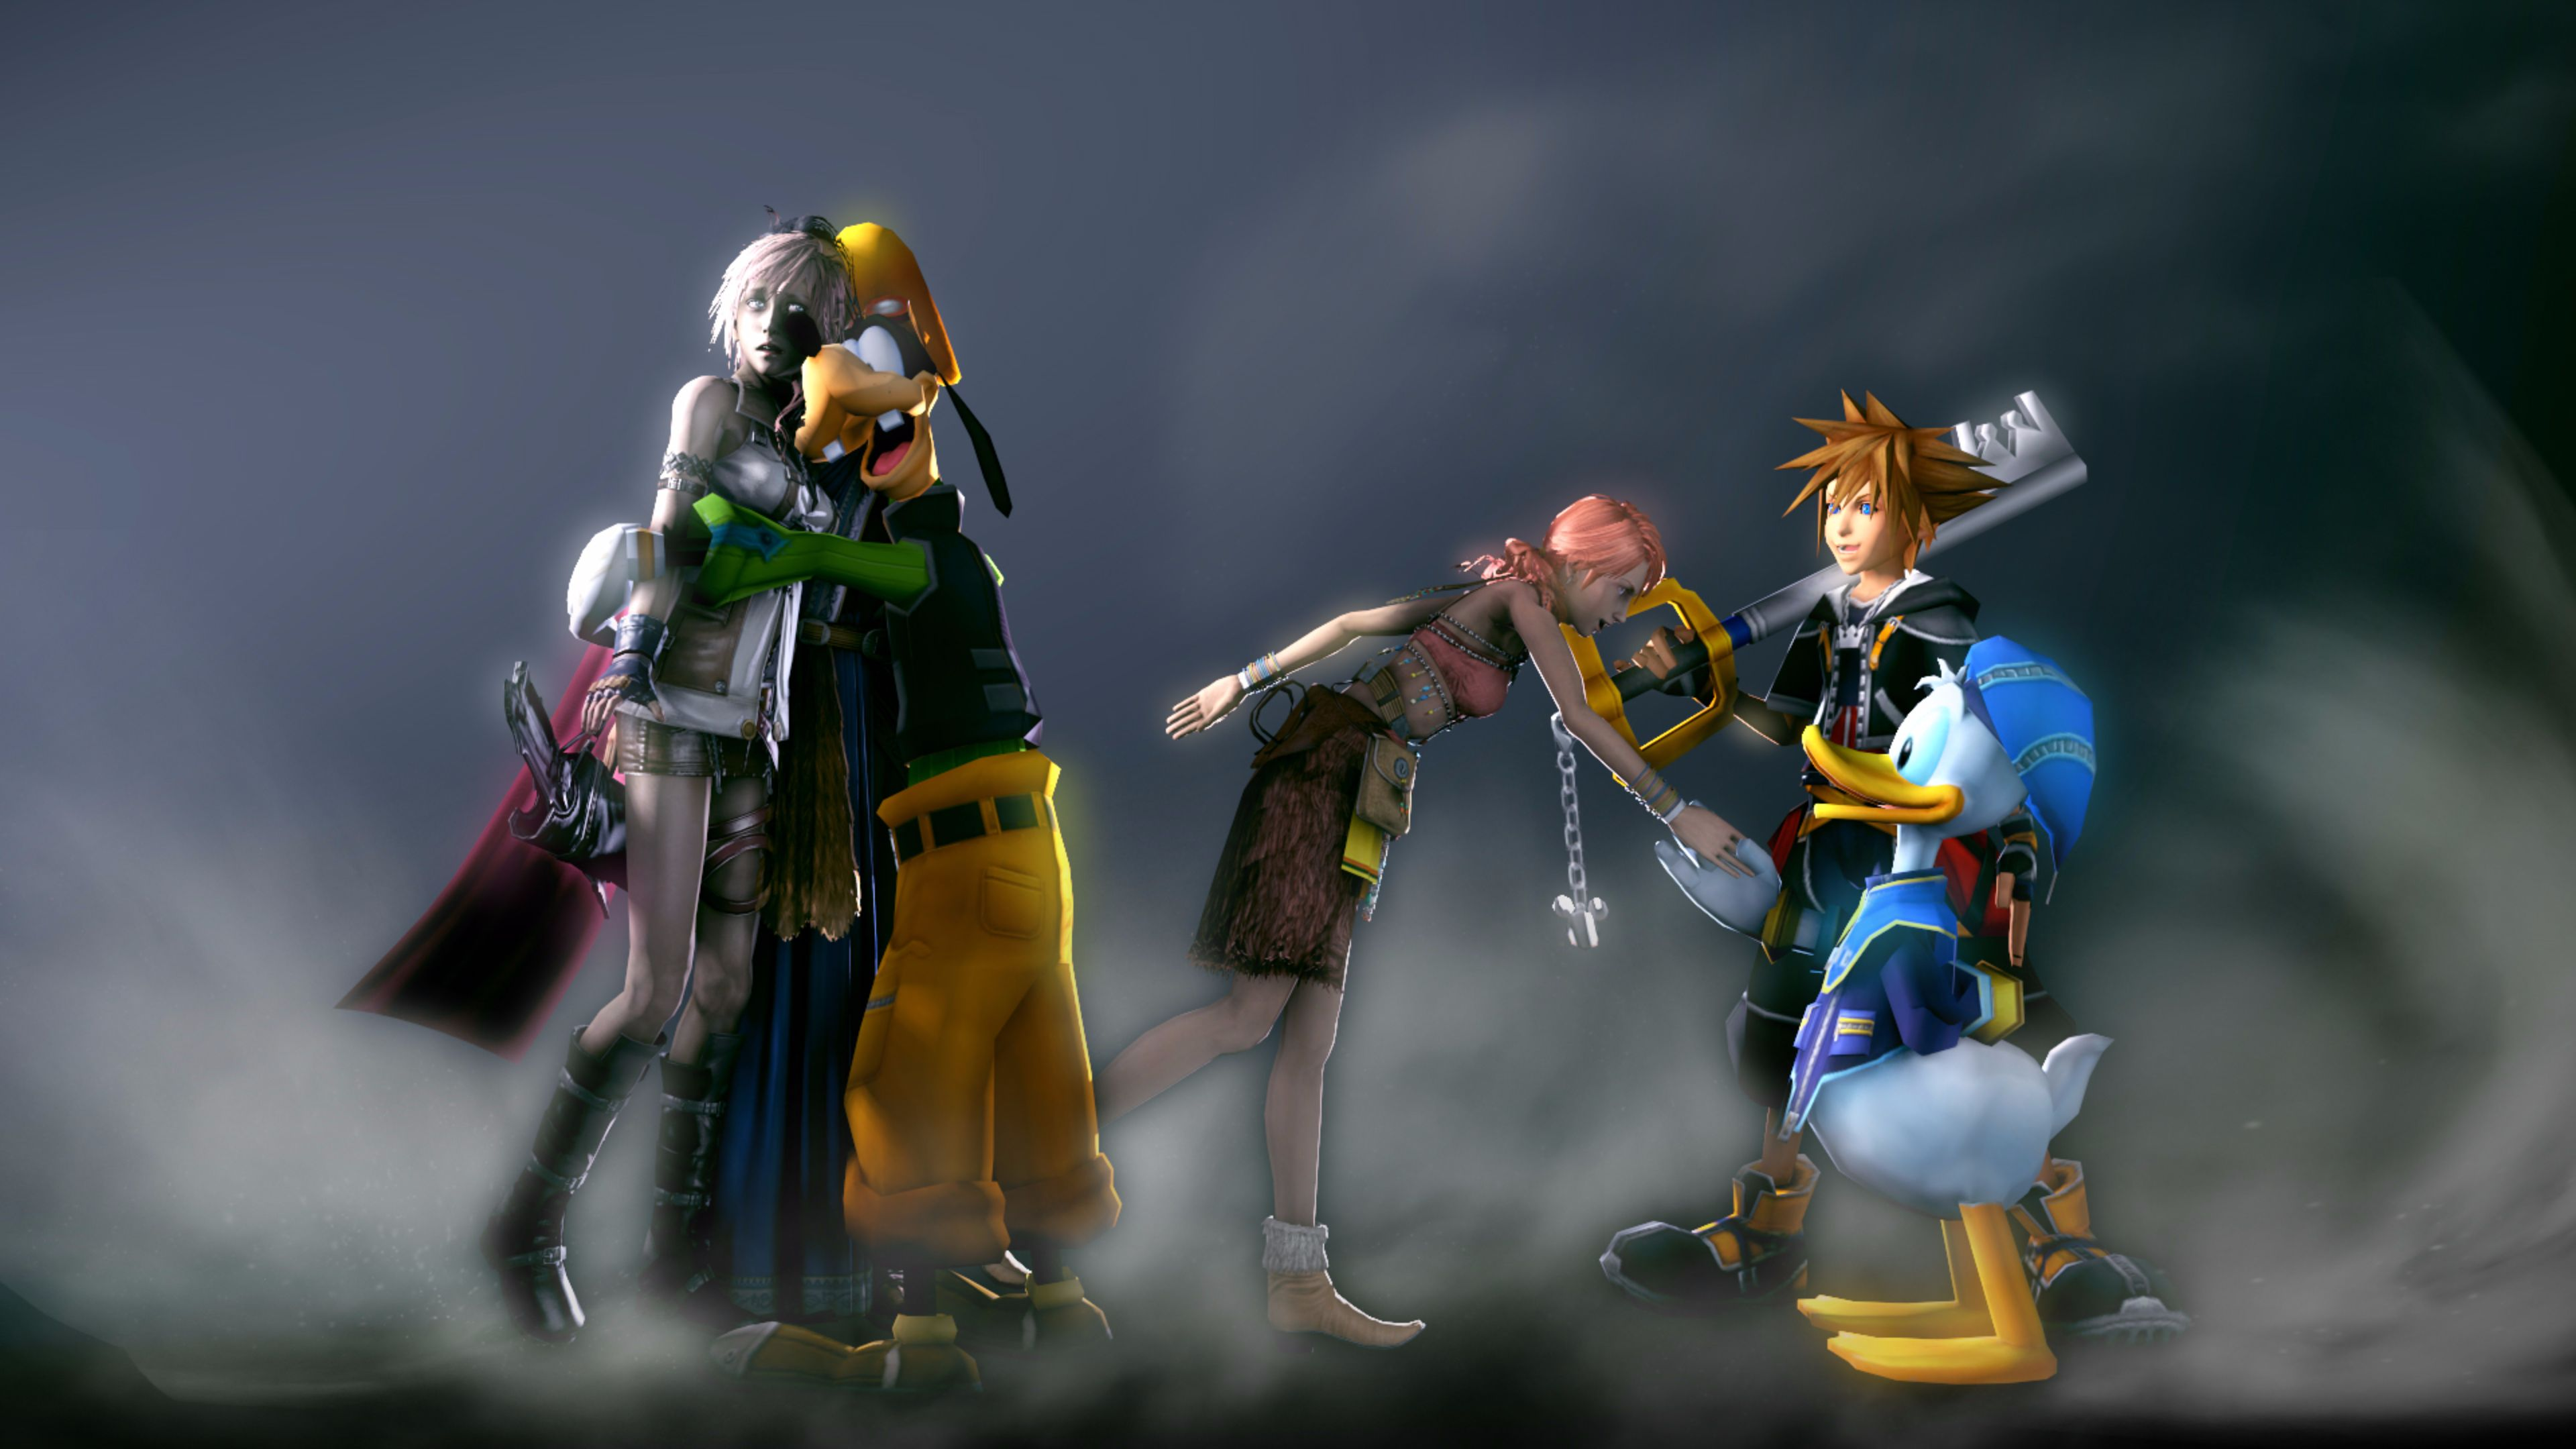 Kingdom Hearts Hd Wallpaper Wallpapersafari